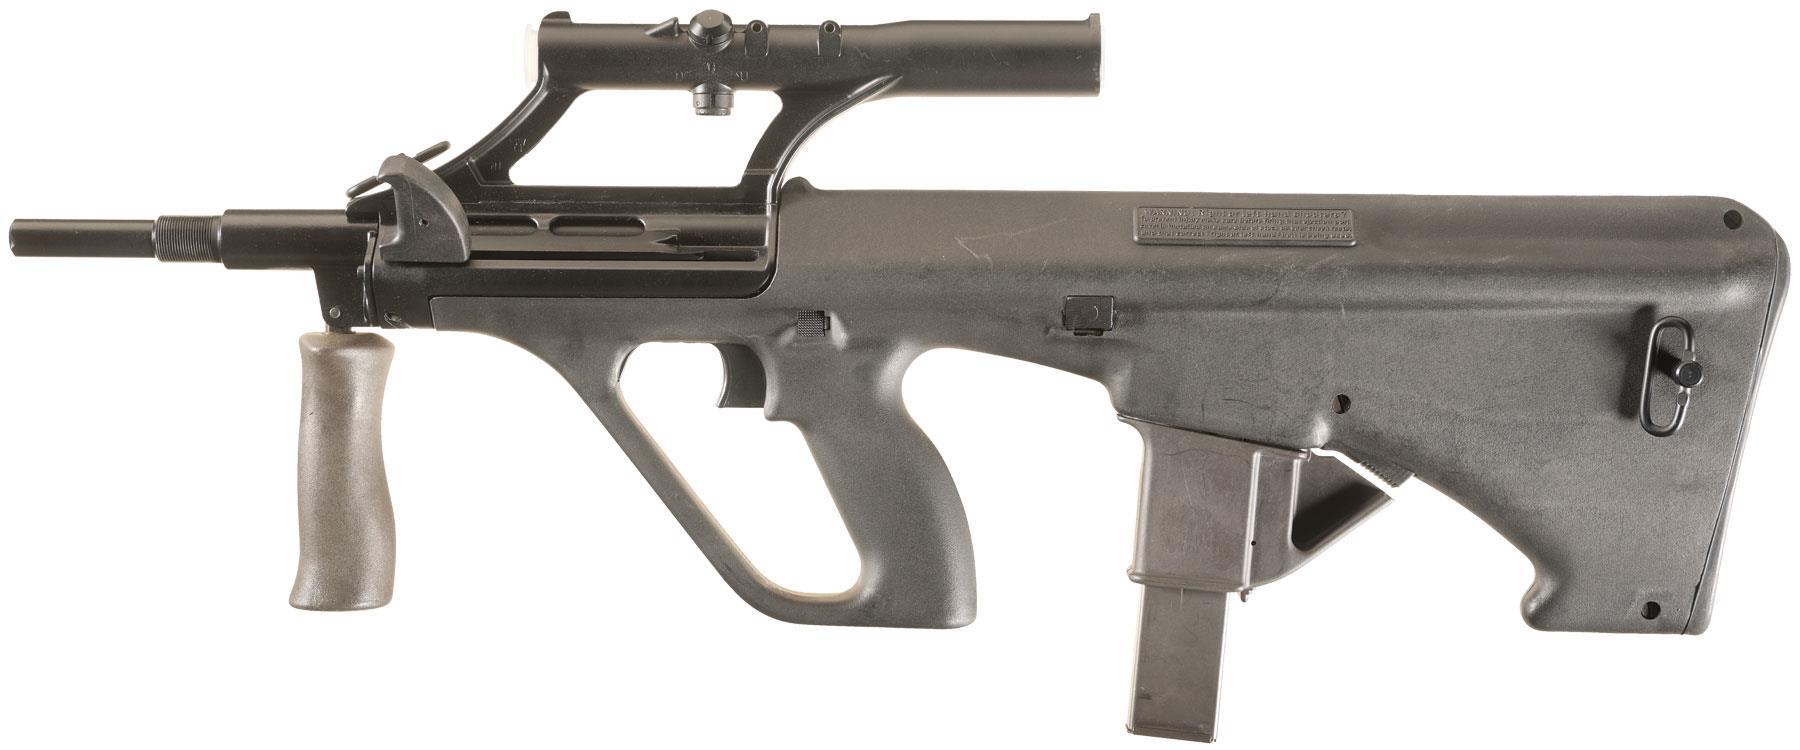 AUG 9mm carbine